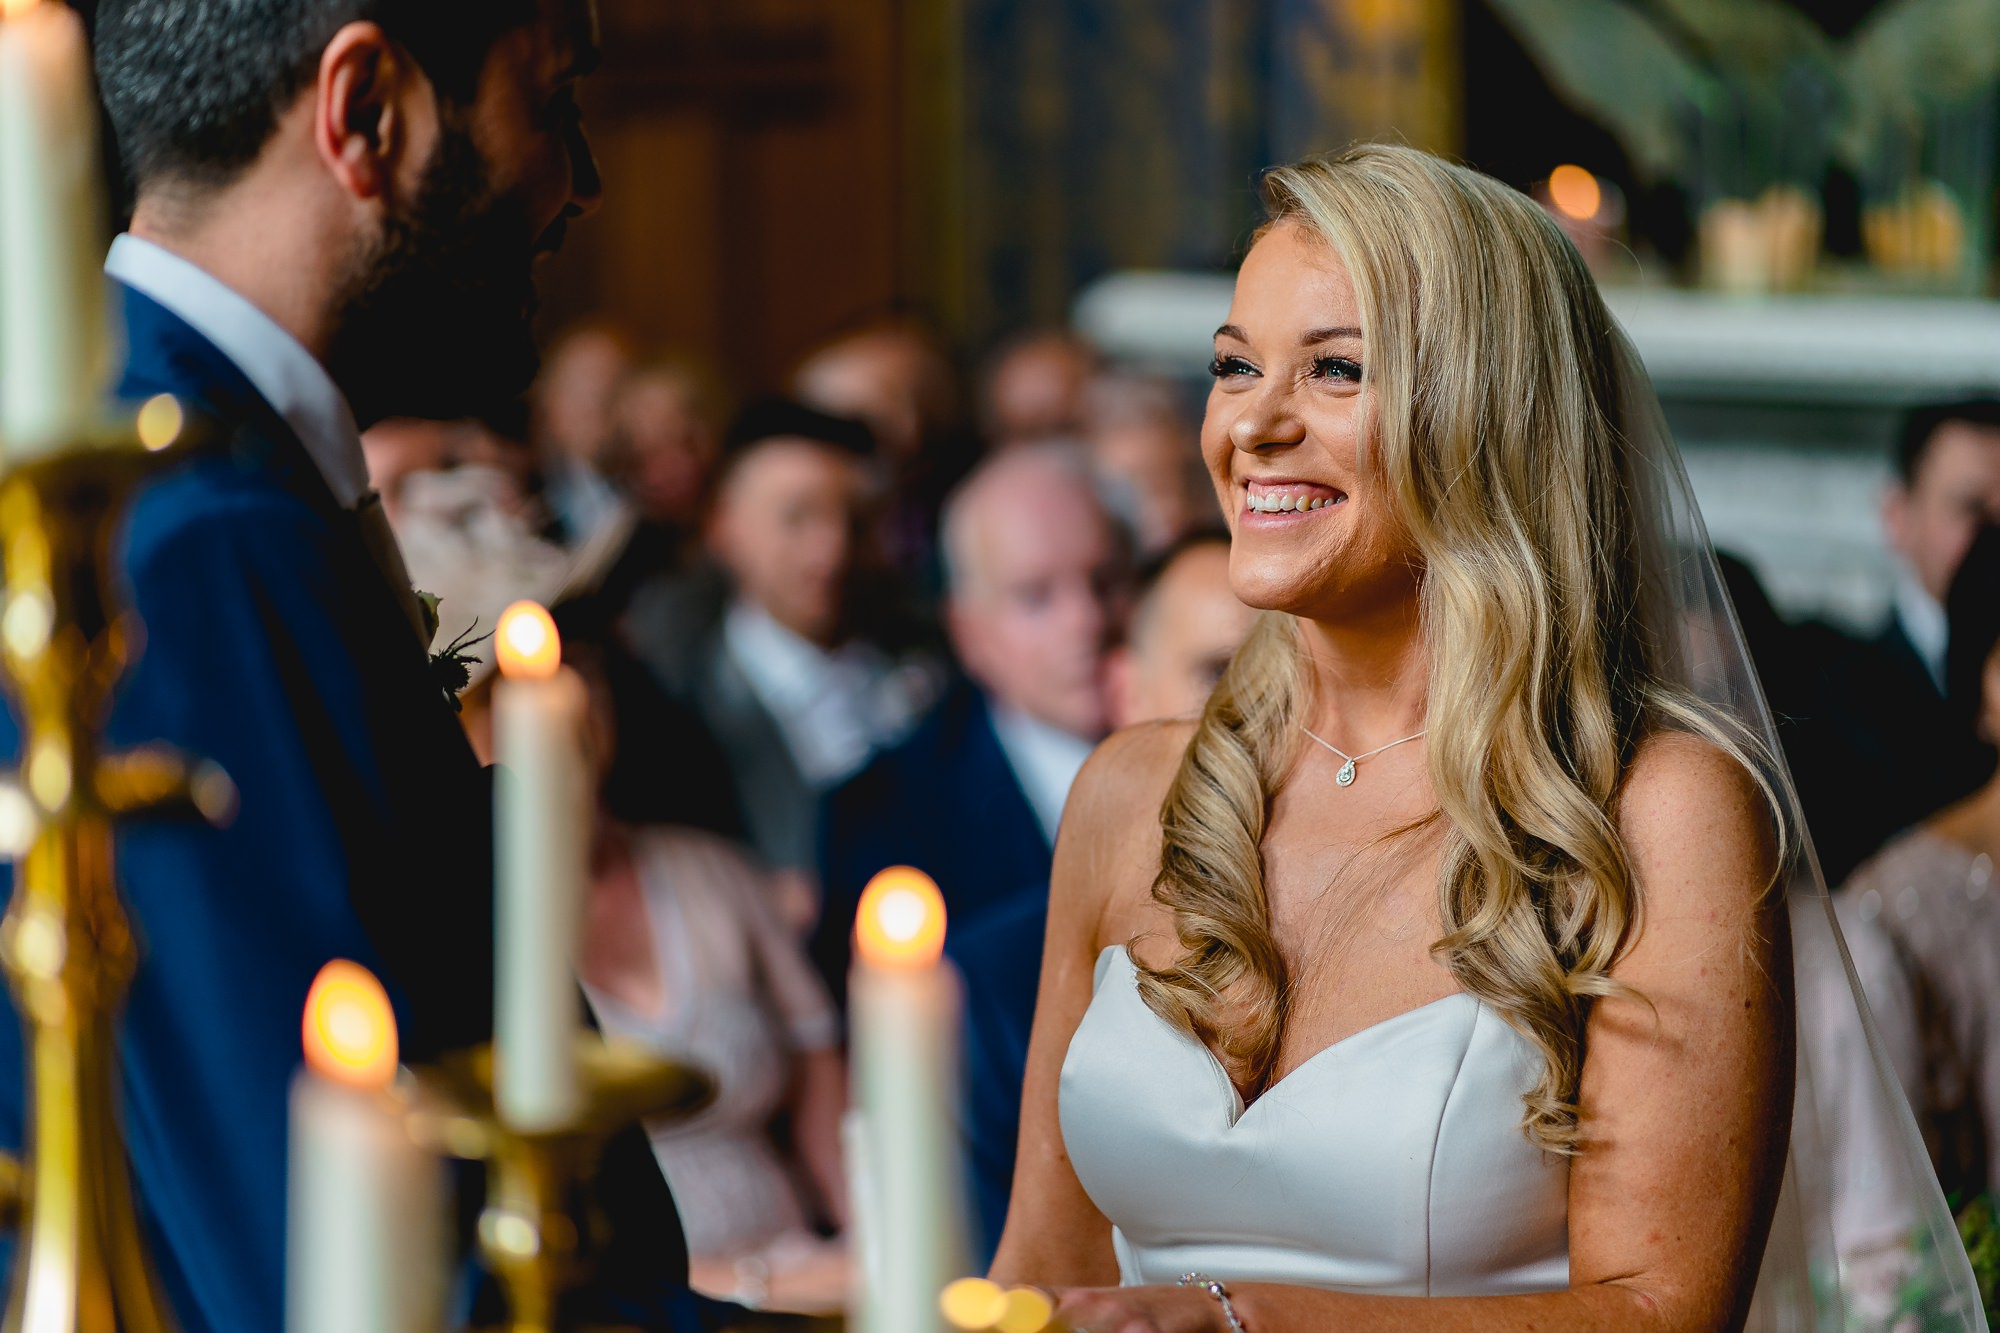 Soughton-Hall-Wedding-Photographer_0006.jpg